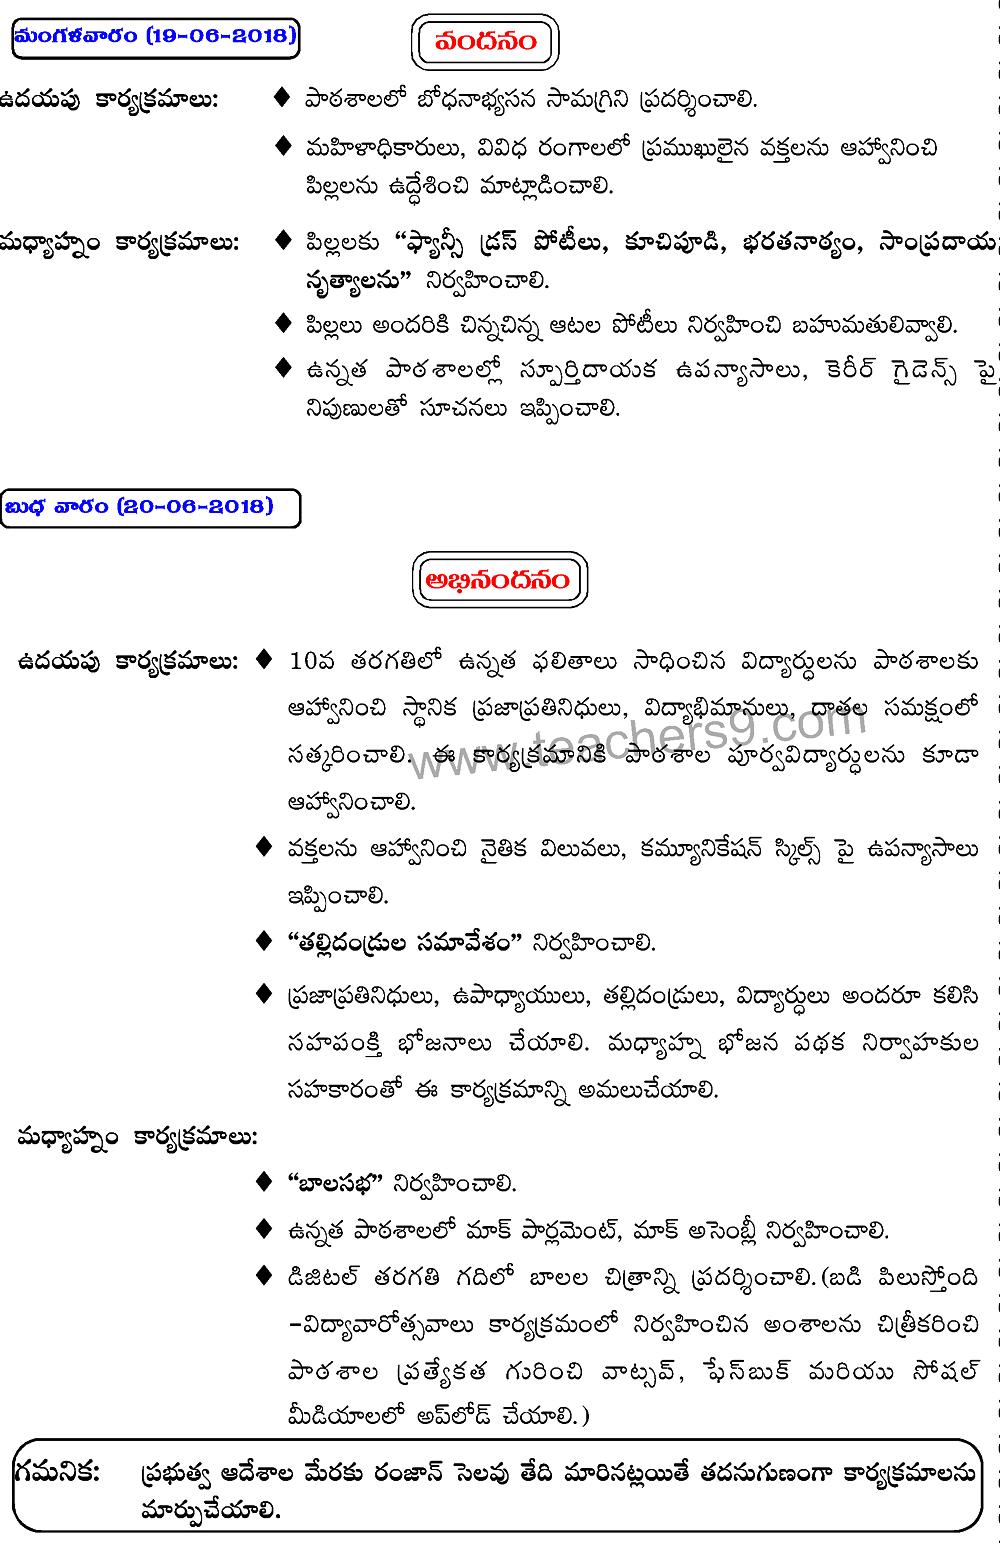 Badi Pilustundi -Vidya Varothsavalu day wise schedule